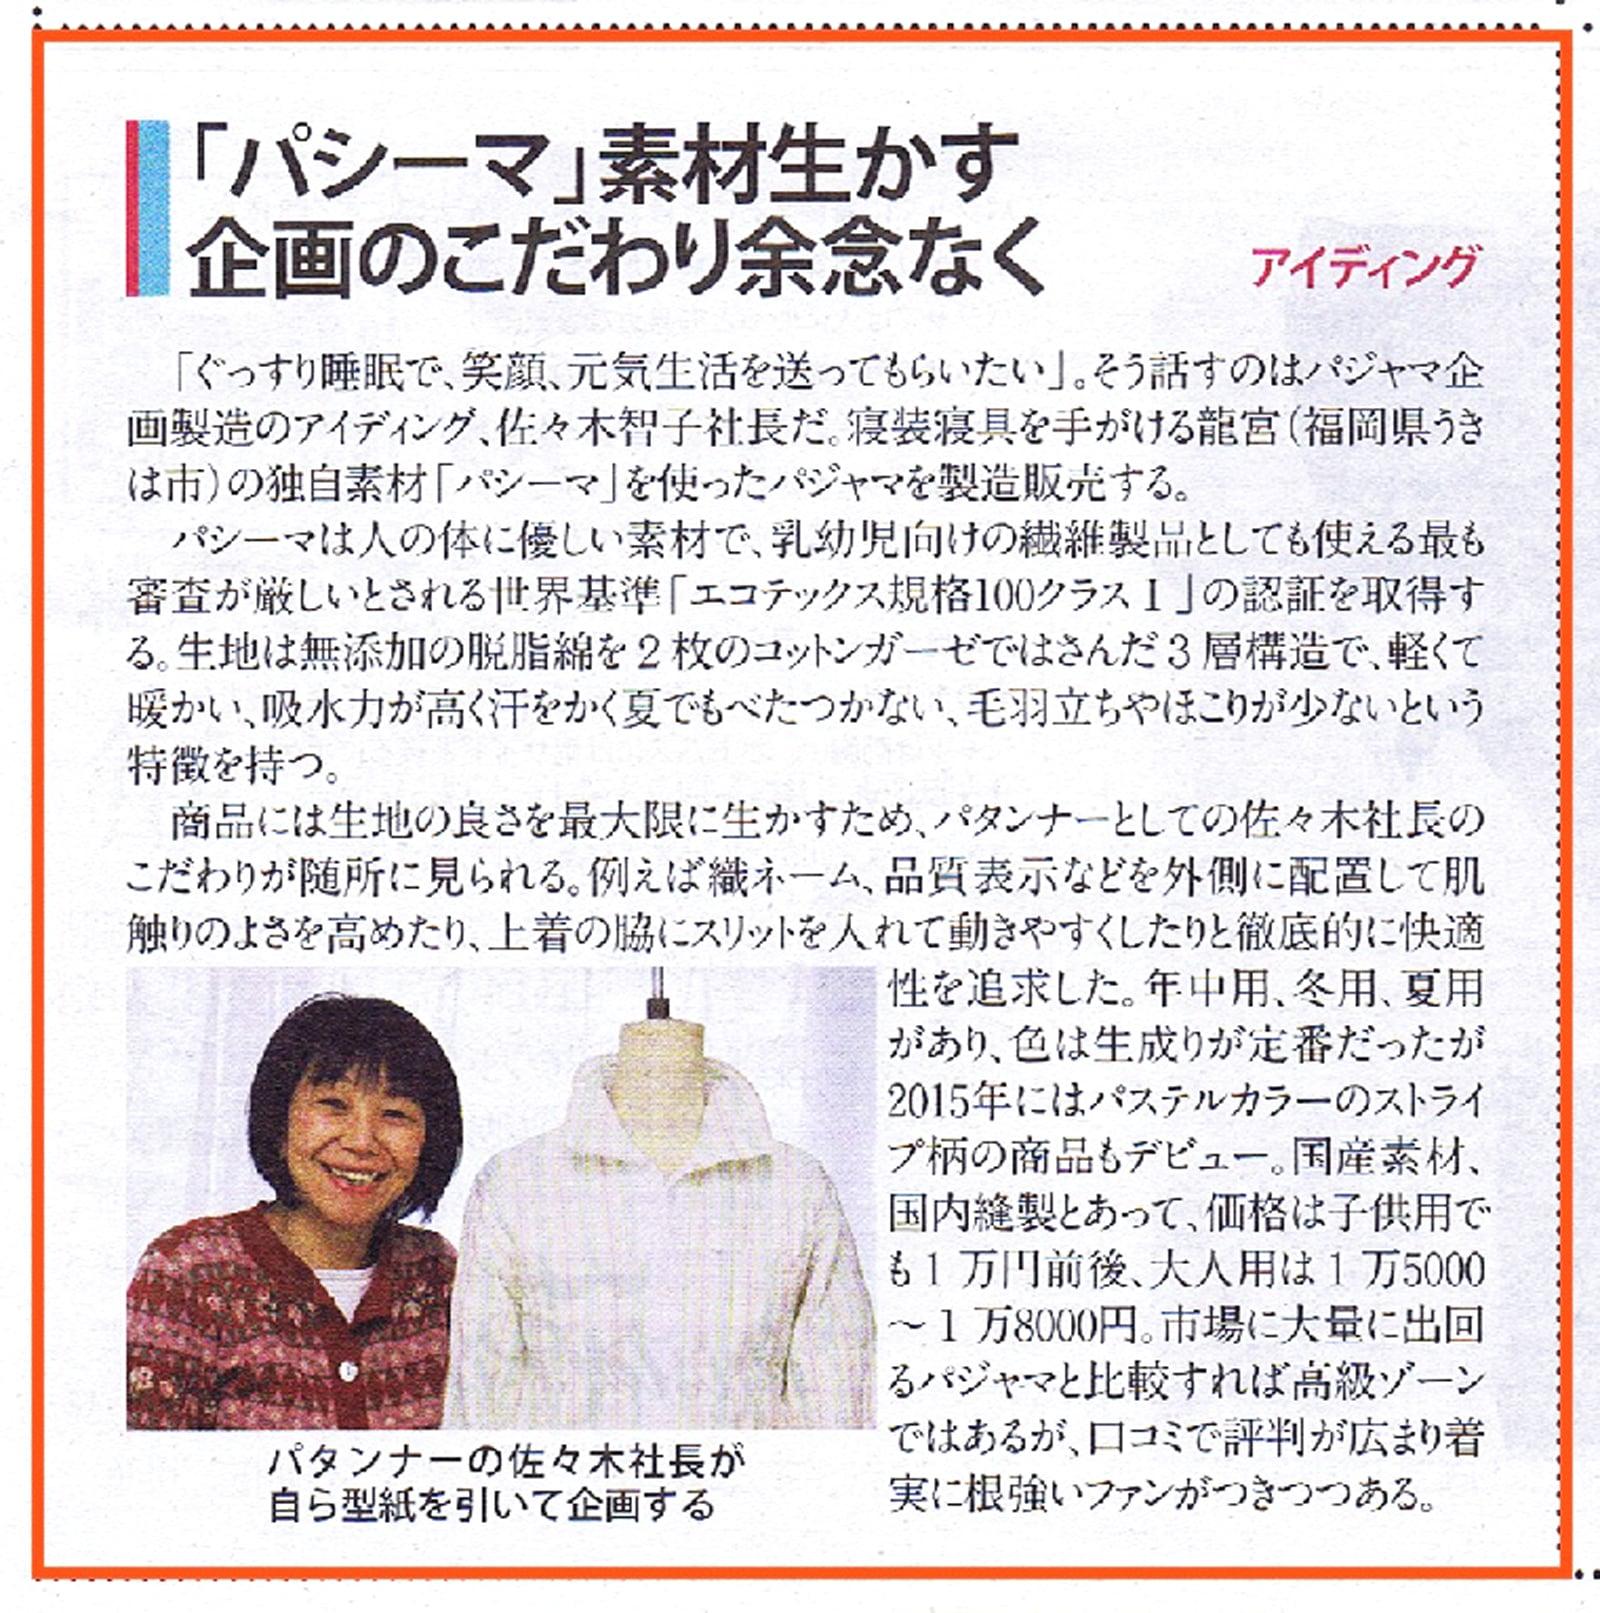 LIVING-BIZ新聞2月号「パジャマ特集」記事